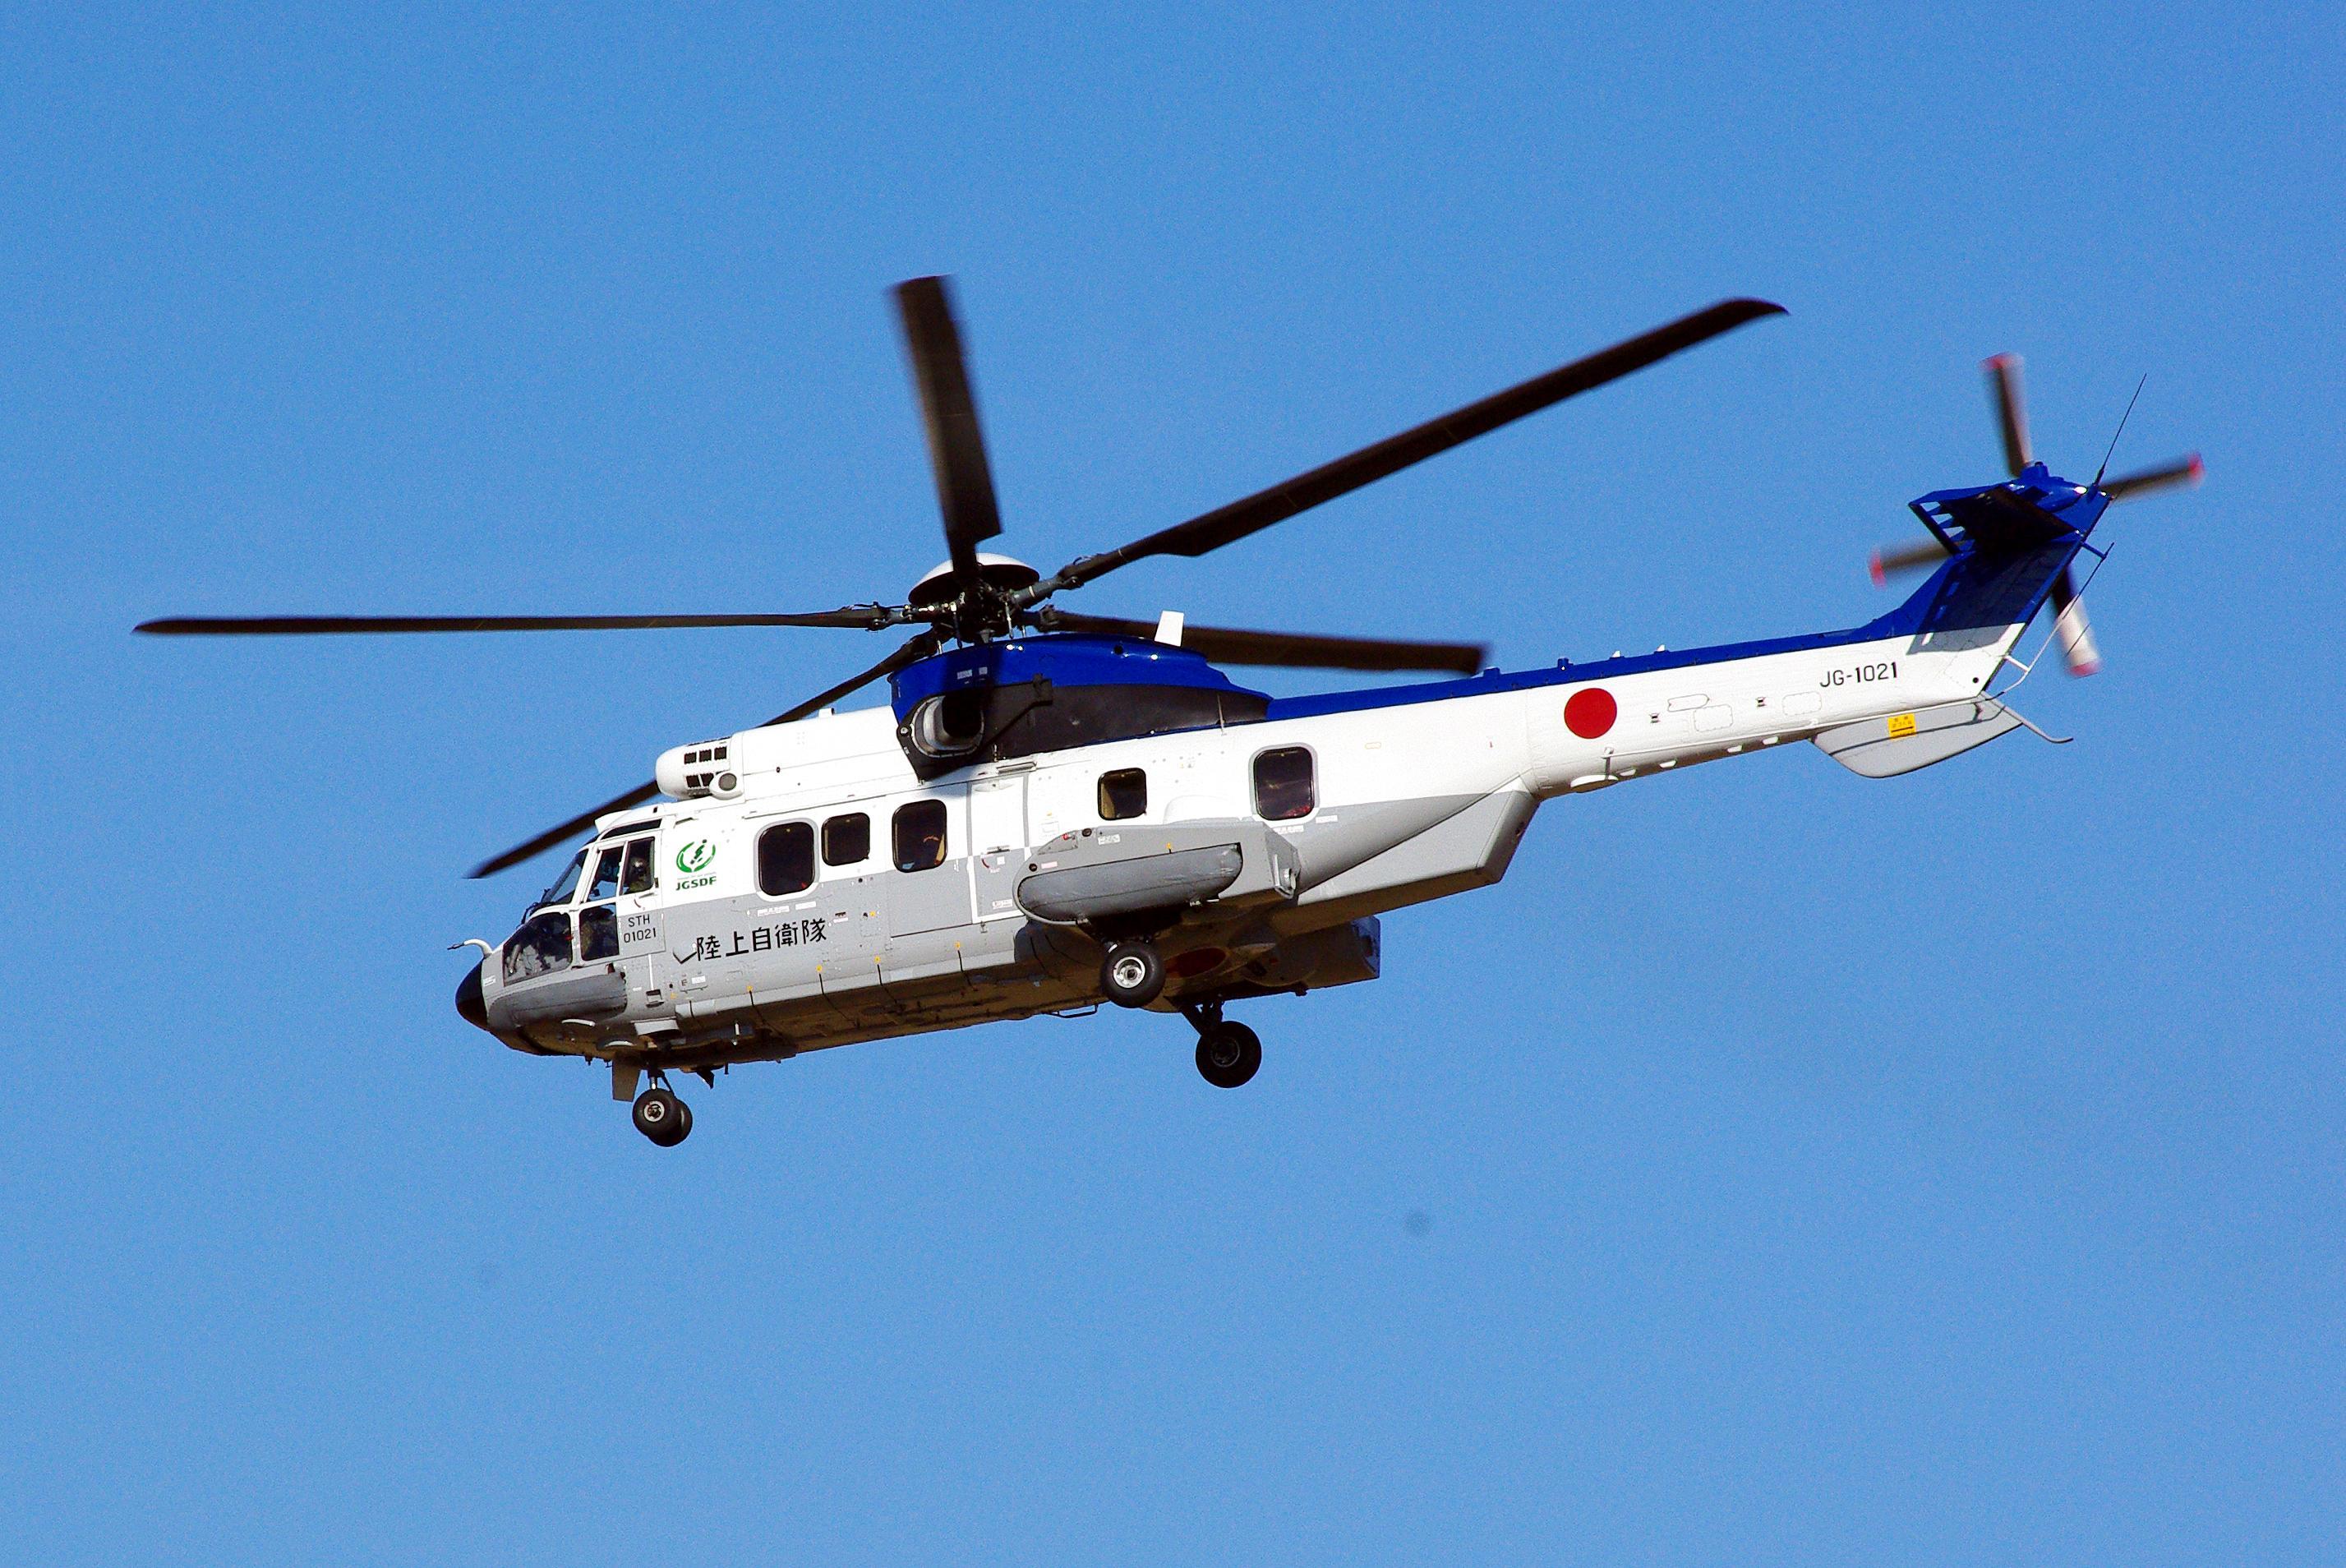 Eurocopter AS332 Super Puma (Cougar) - YouTube